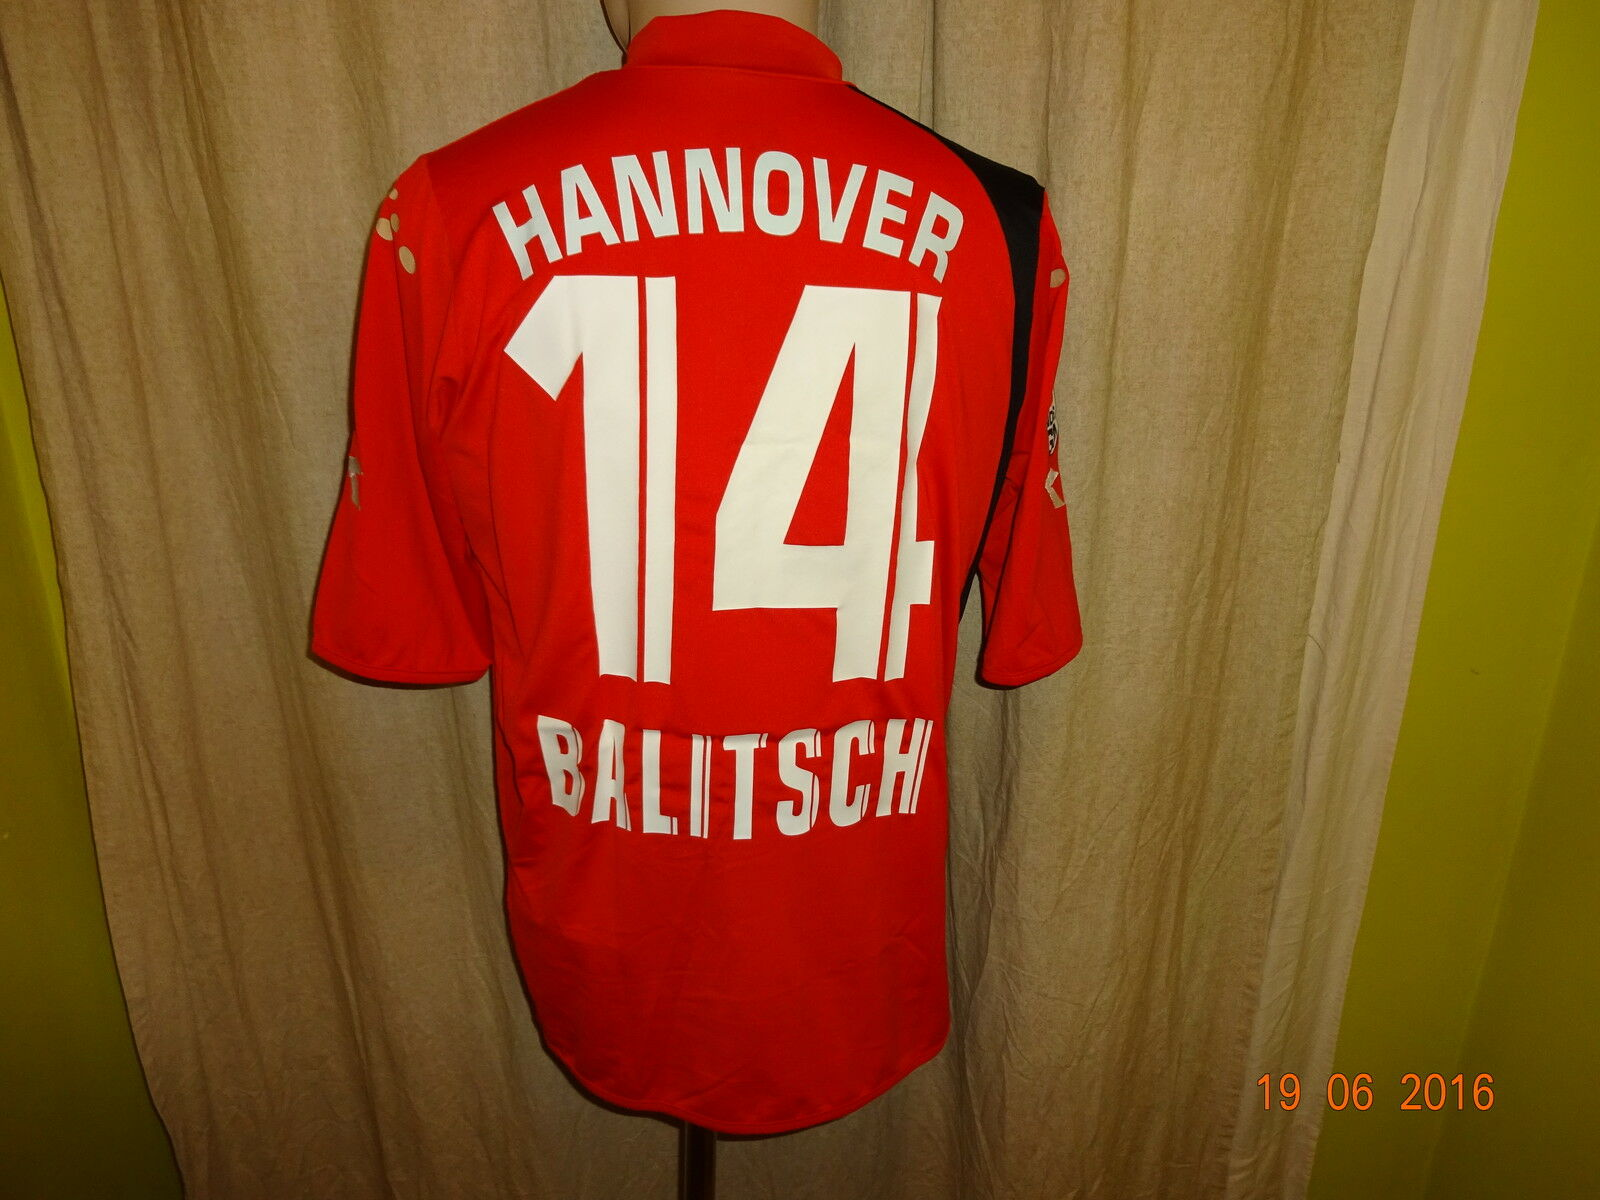 Hannover 96 Original Diadora Heim Trikot 2005 2005 2005 06  TUI  + Nr.14 Balitsch Gr.M- L    Sehr gute Qualität  5b0ff4